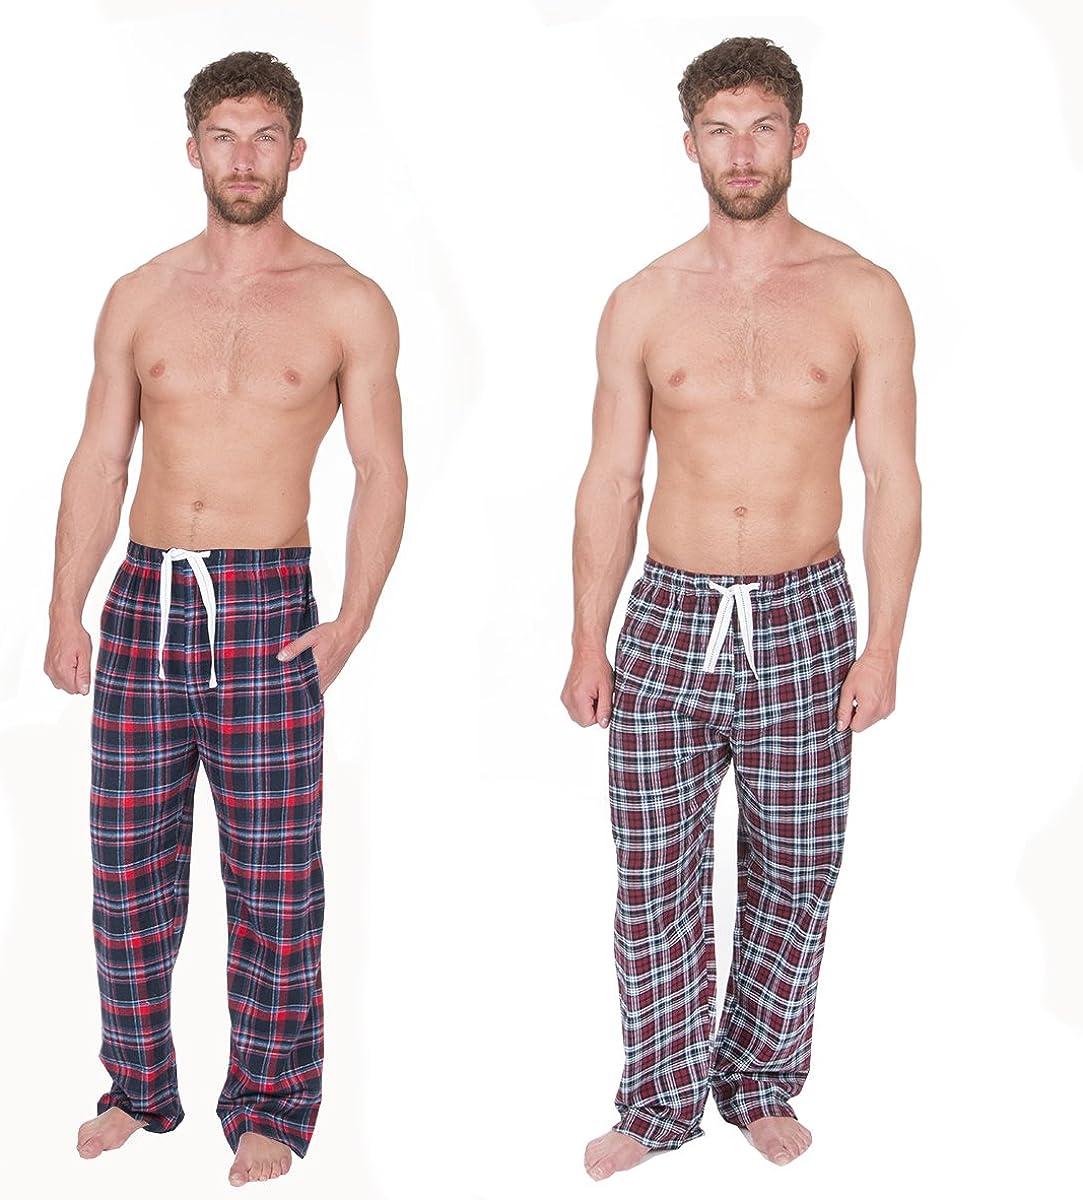 Cargo Bay Mens 2 Pack Checkered Flannel Woven Lounge Pants PJ Bottoms Tartan UK